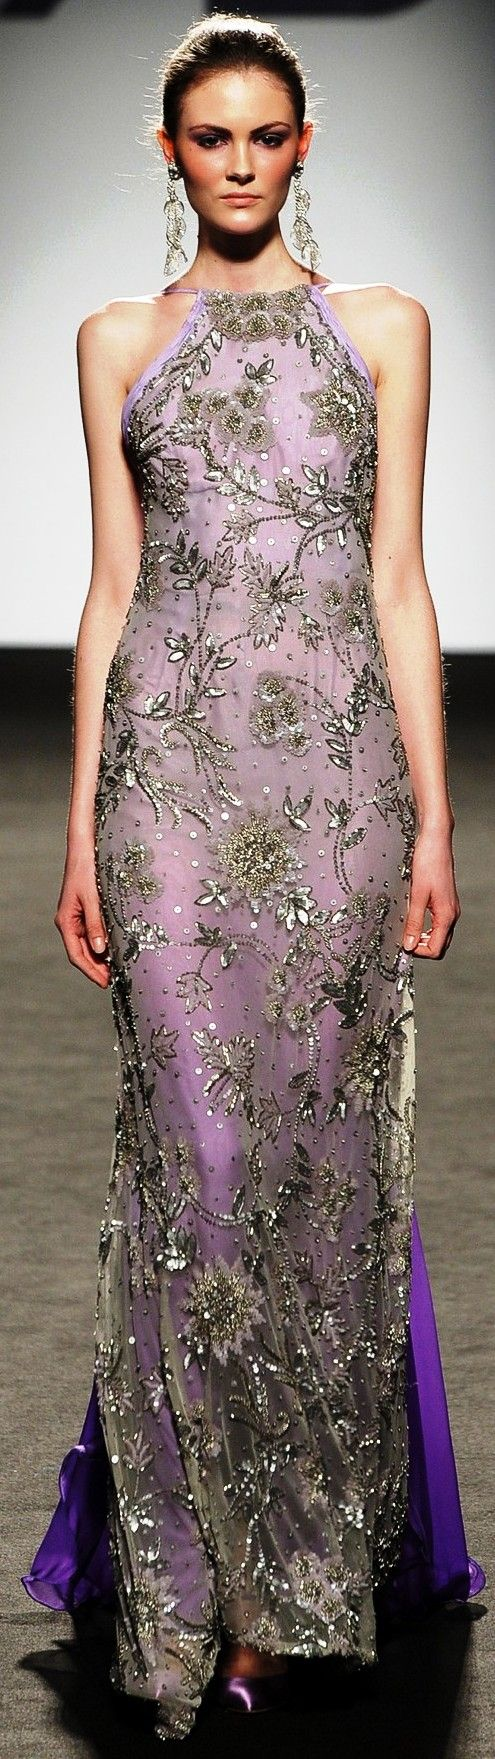 Renato Balestra PE 2011 Haute Couture S/S Paris